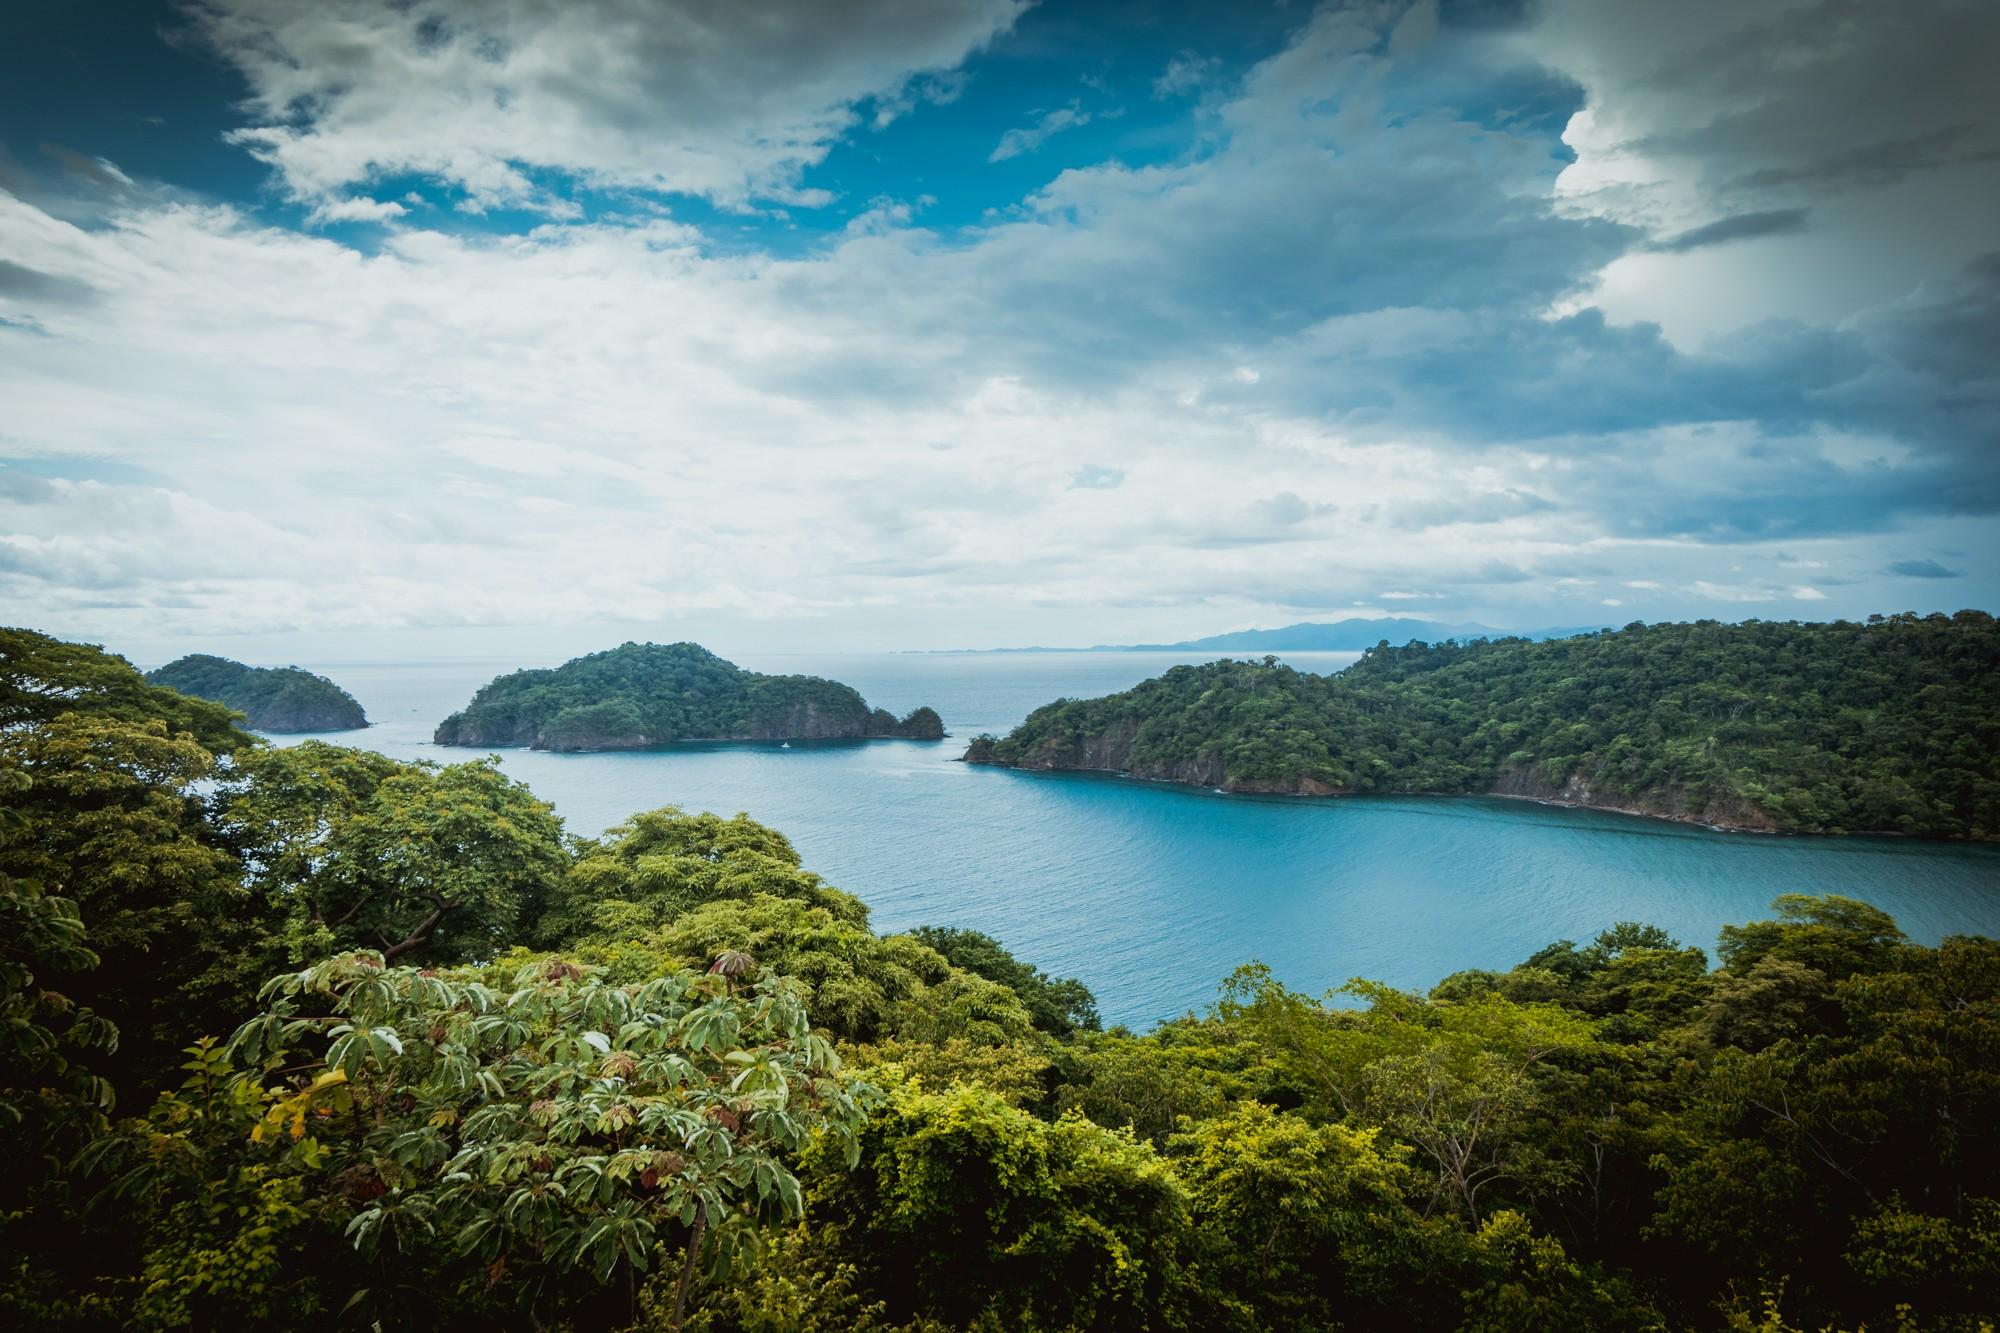 Four Seasons Costa Rica peninsula Papagayo